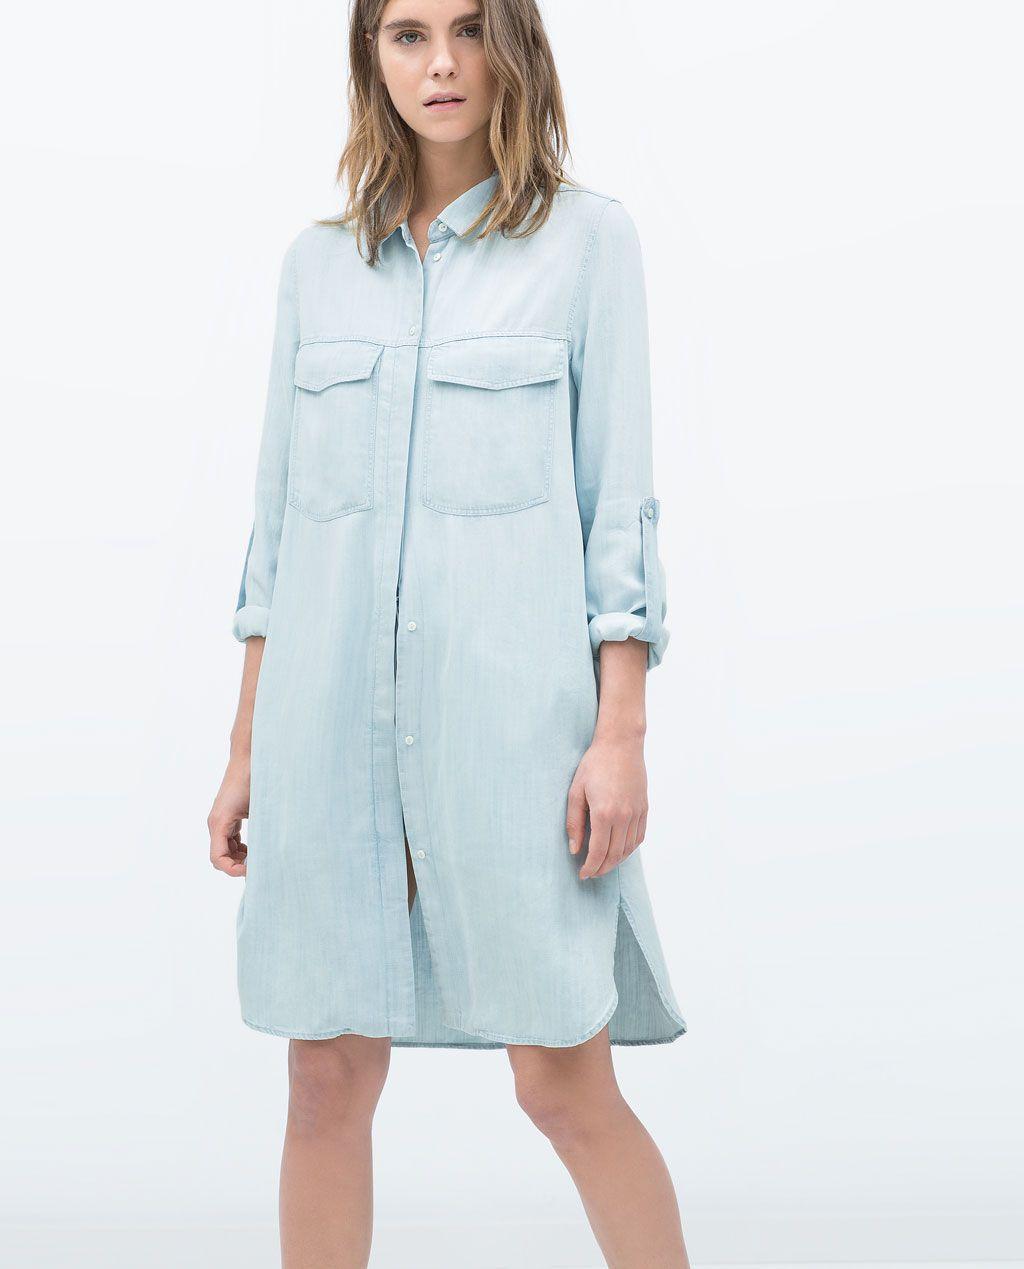 Chemise Jean Longue destiné zara - femme - chemise denim longue | fashion | pinterest | zara